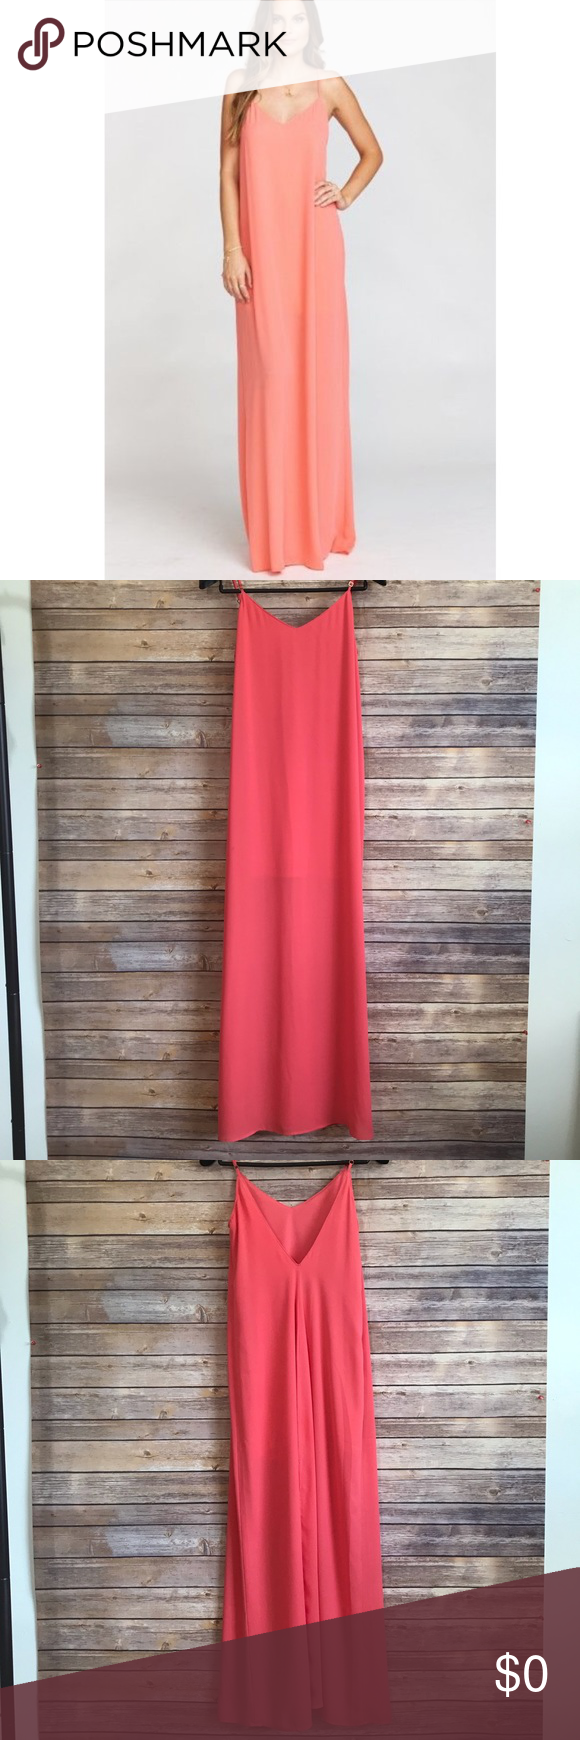 Show Me Your Mumu Jolie Coral Maxi Dress Coral Maxi Dresses Maxi Dress Pattern Maxi Dress [ 1740 x 580 Pixel ]